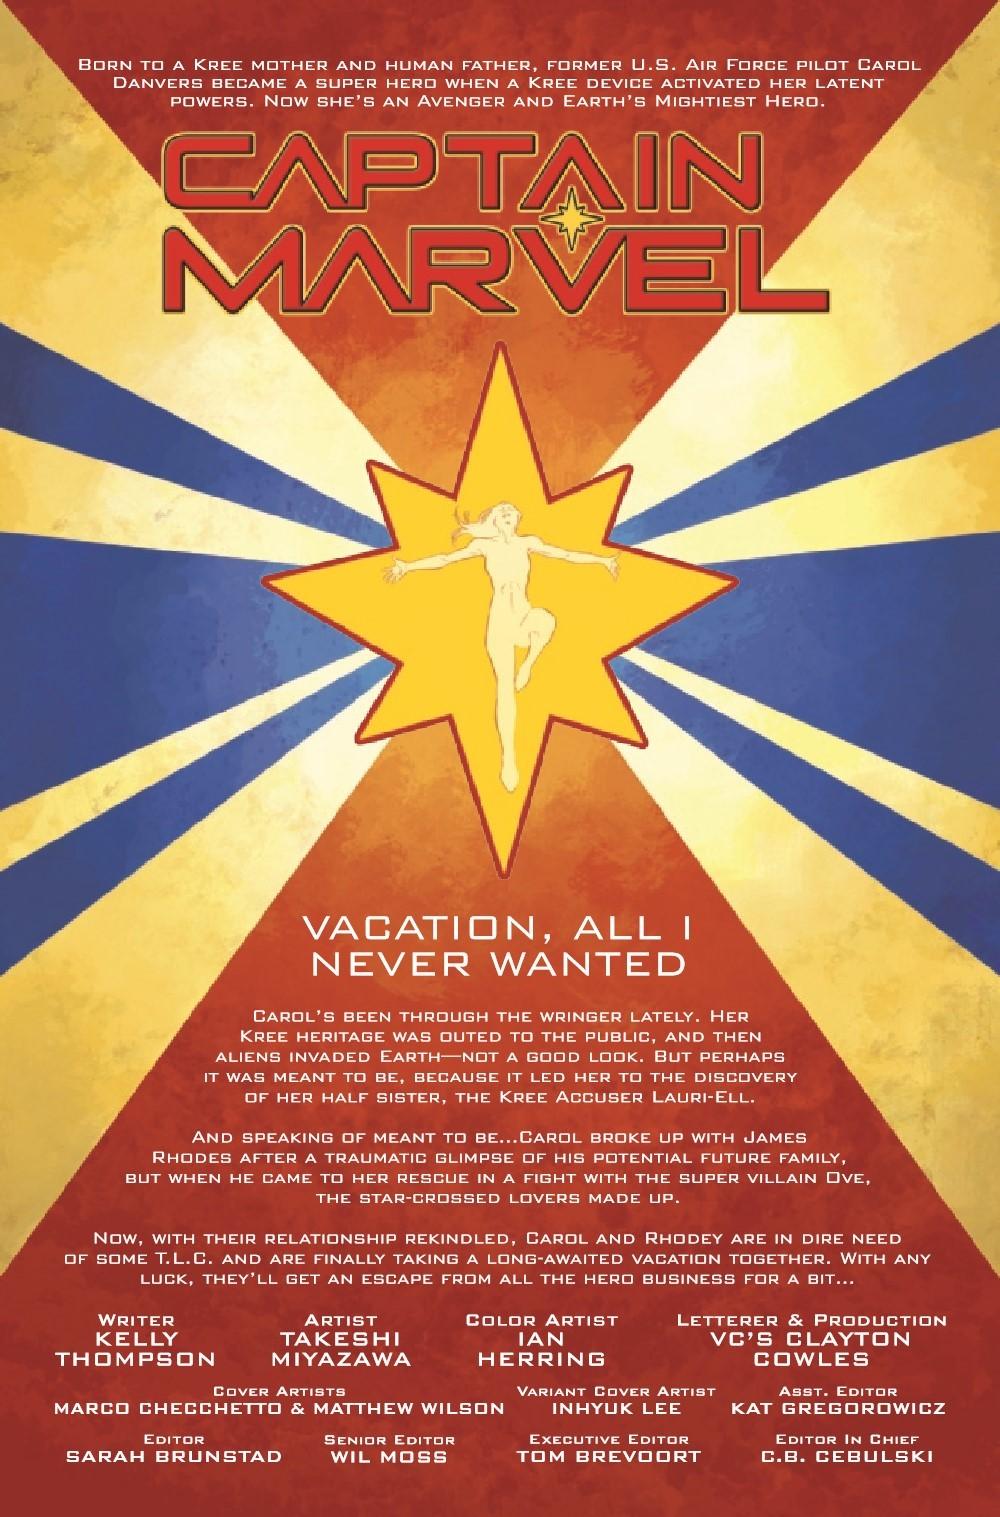 CAPMARV2019031_Preview-2 ComicList Previews: CAPTAIN MARVEL #31